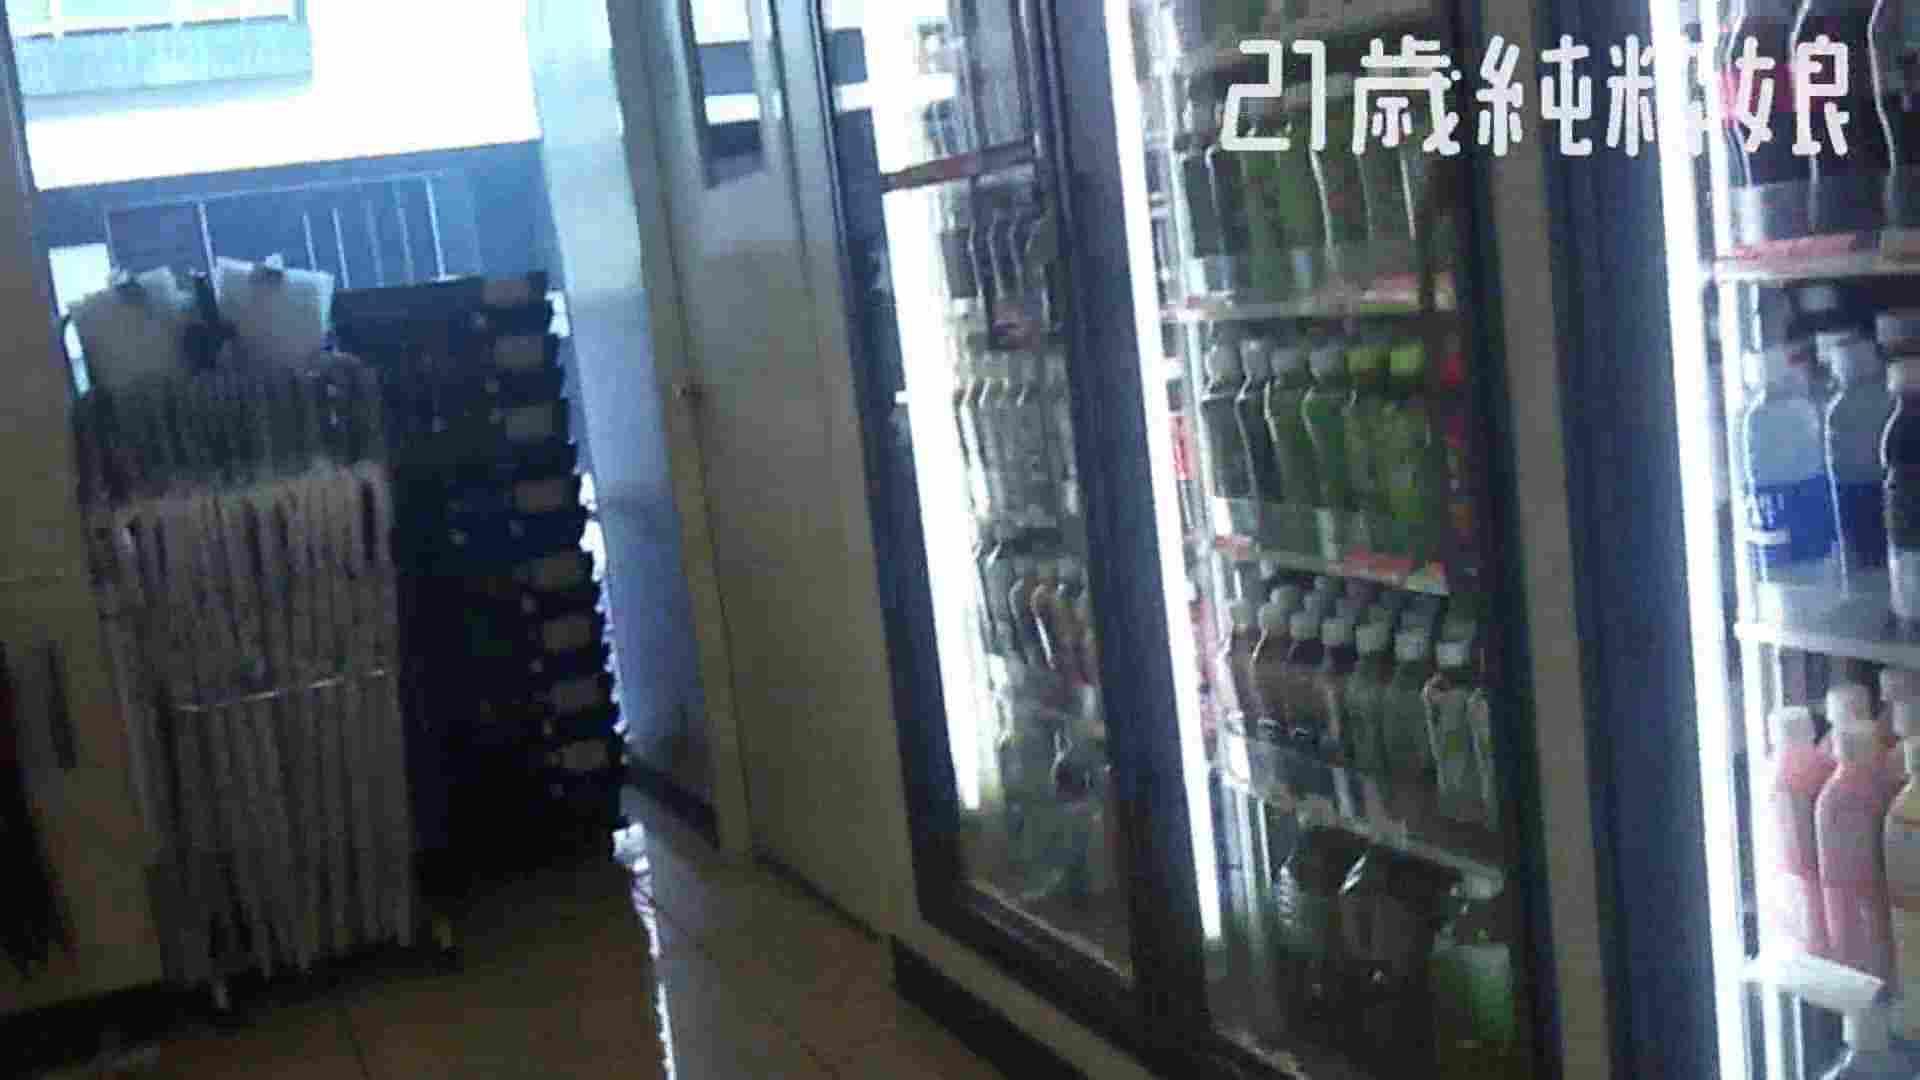 Gカップ21歳純粋嬢第2弾Vol.5 性欲丸出し | 学校  101pic 94